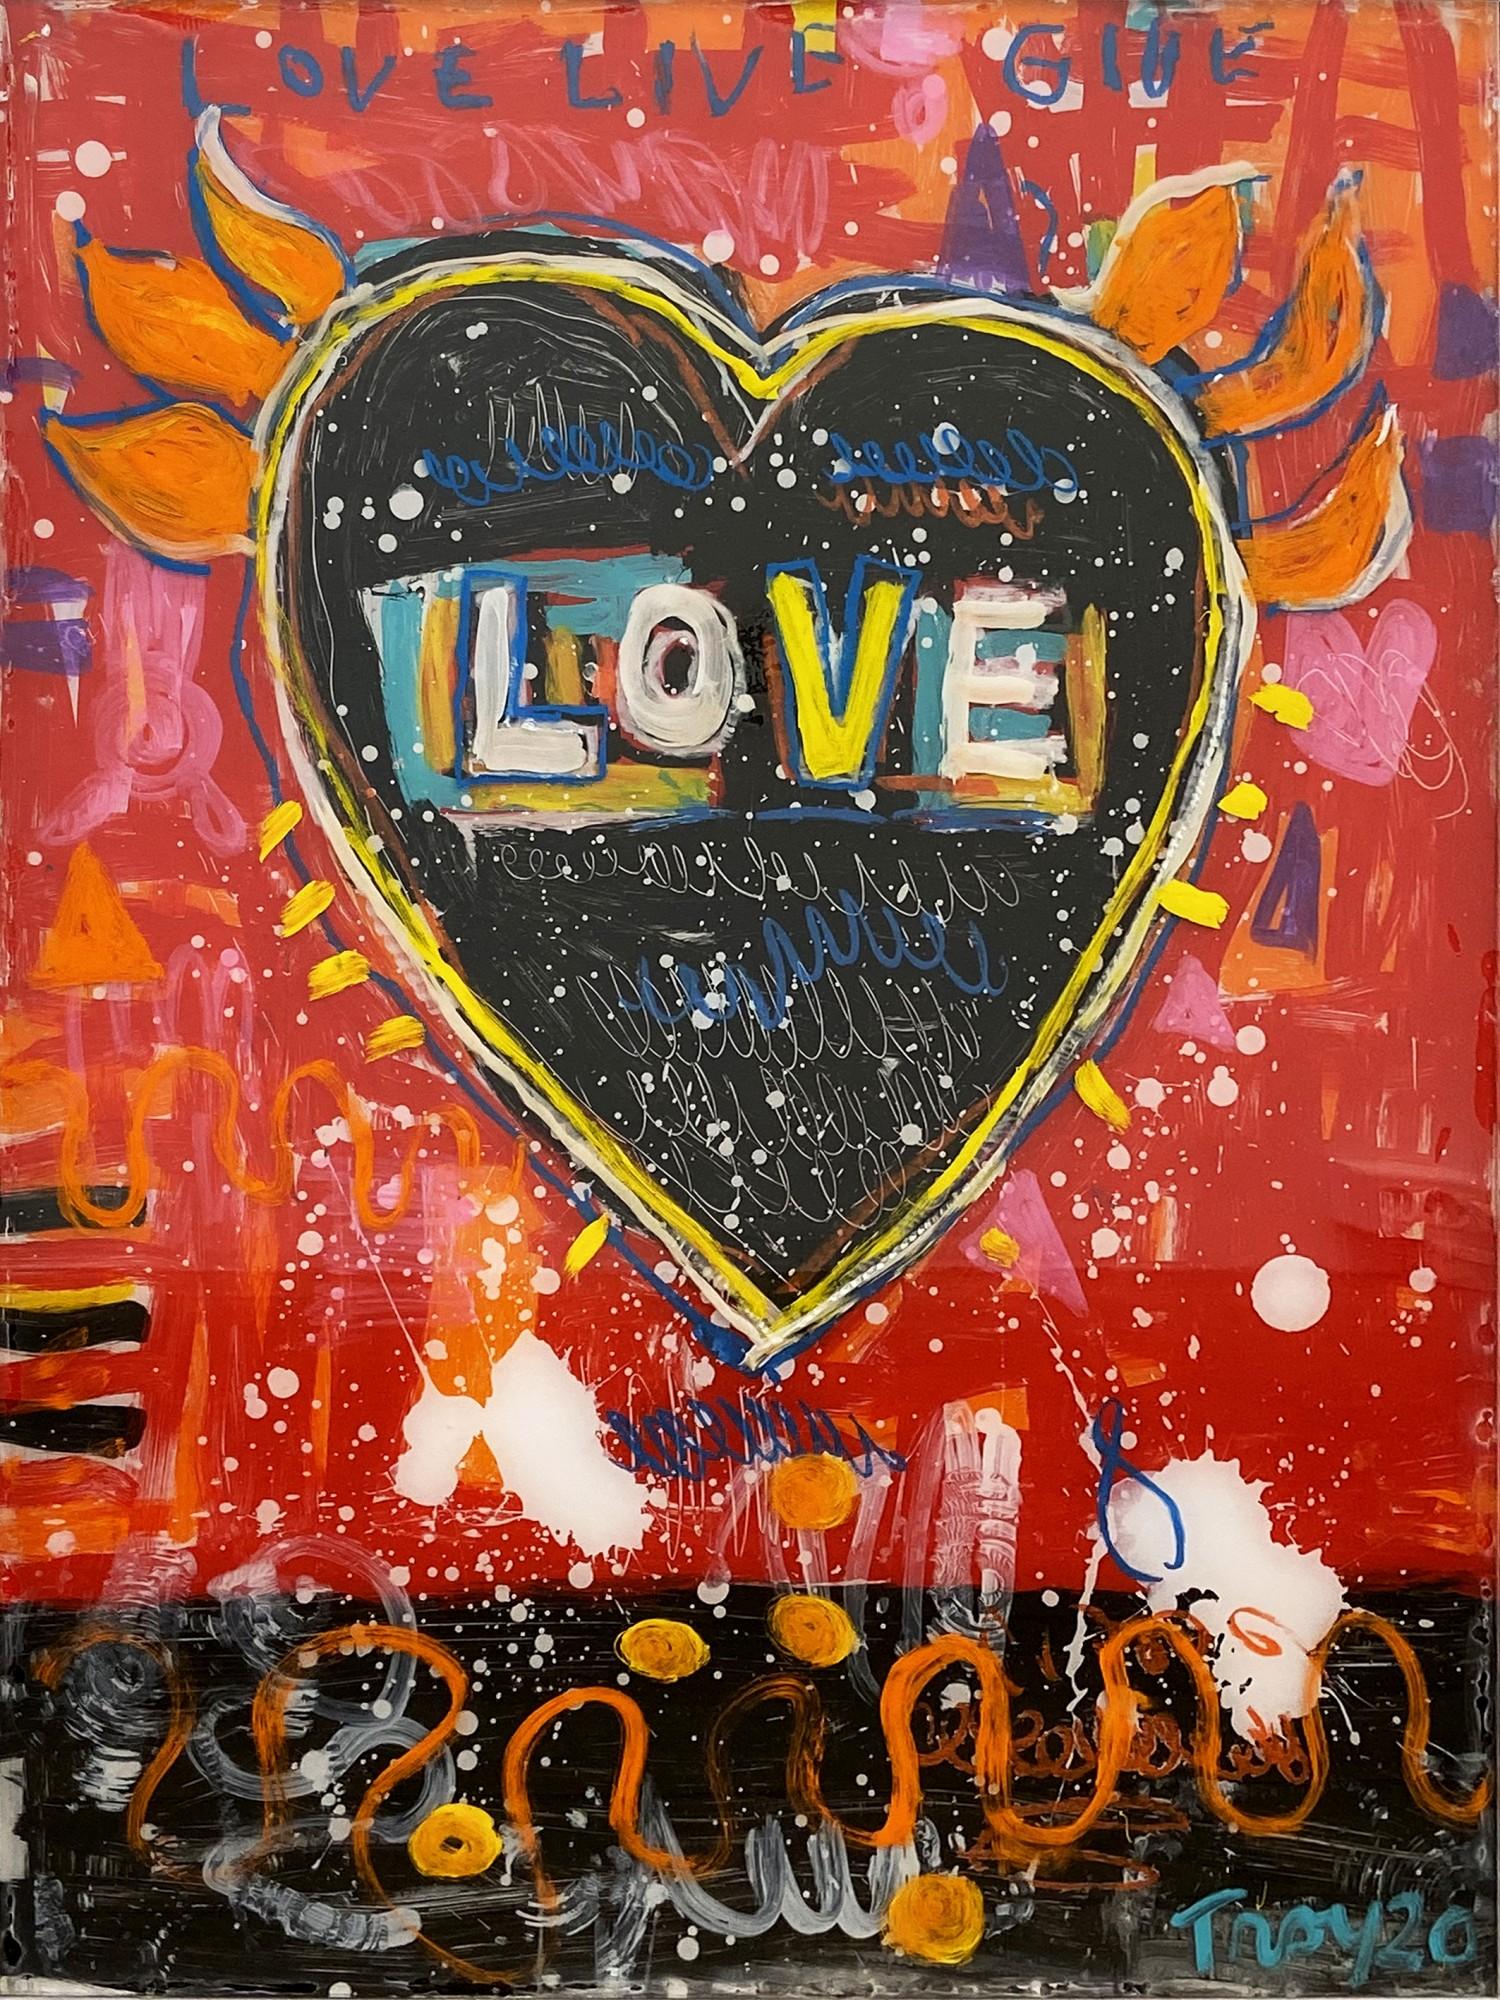 Troy Henriksen - Love live